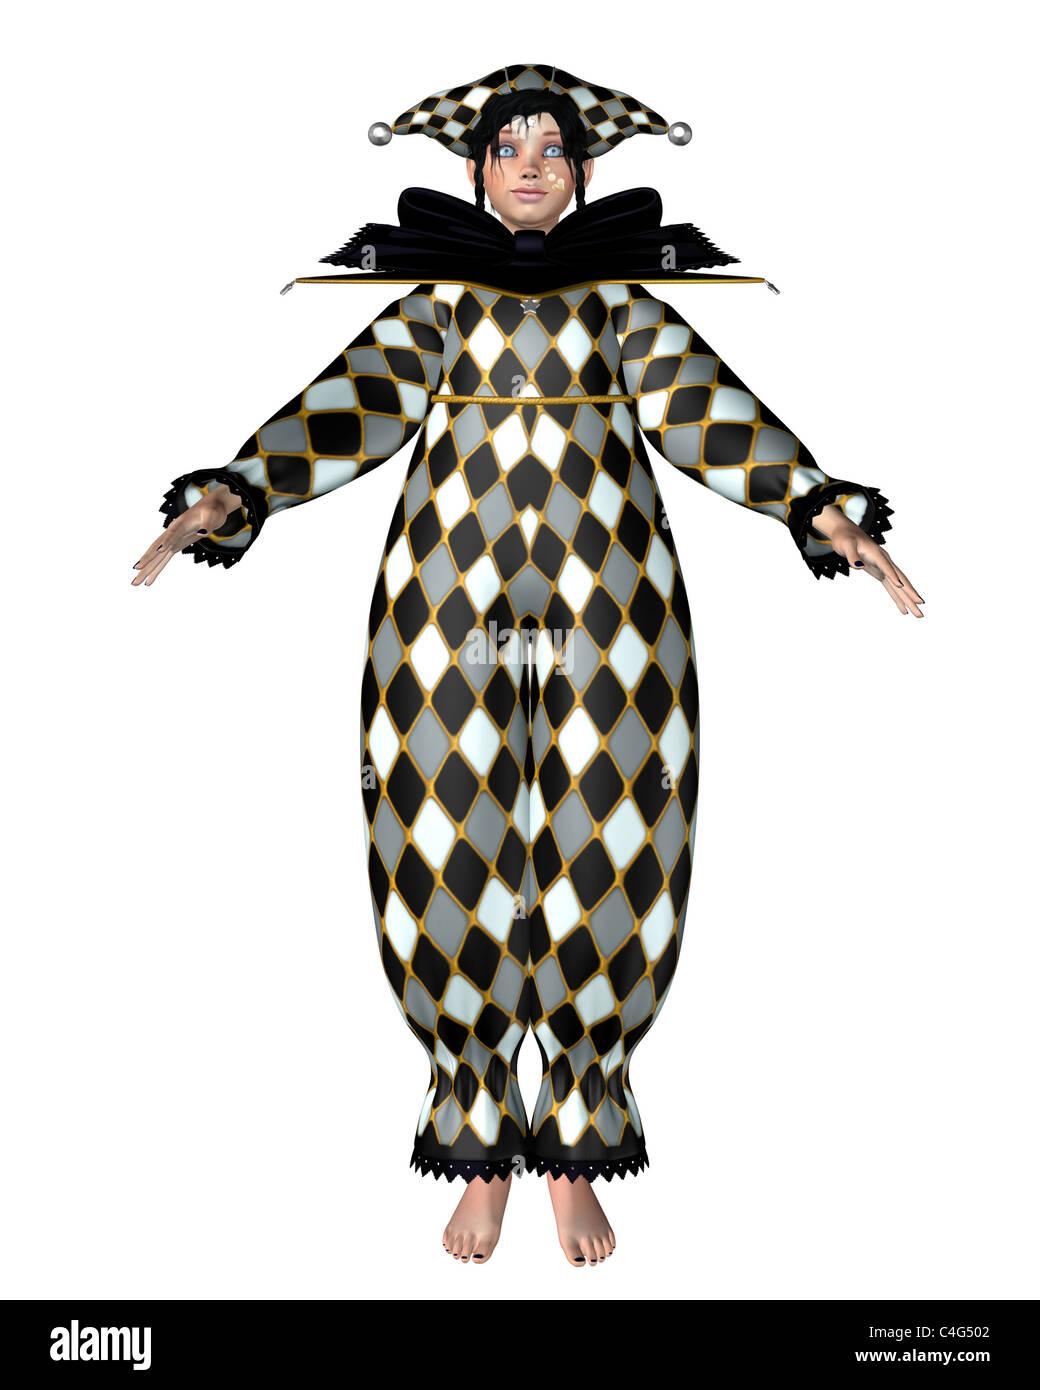 Pierrot Clown Doll - Harlequin checks - Stock Image